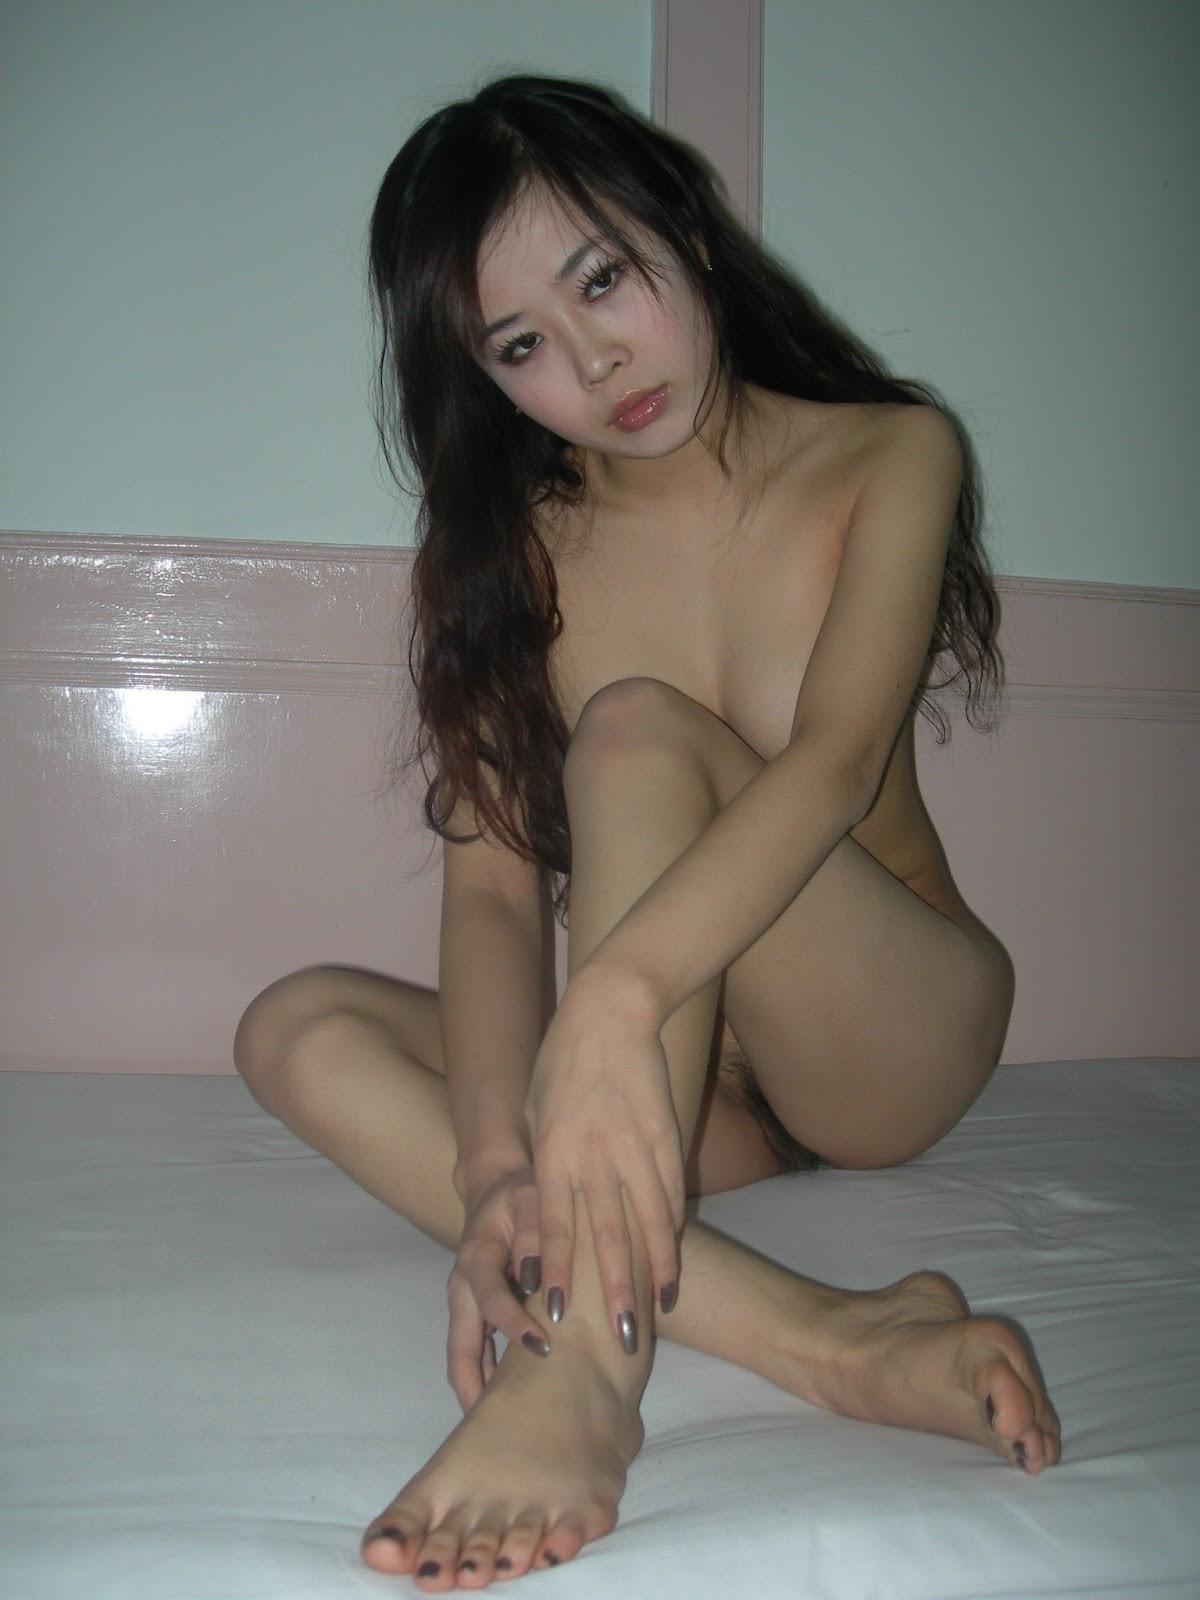 Taiwanese nude